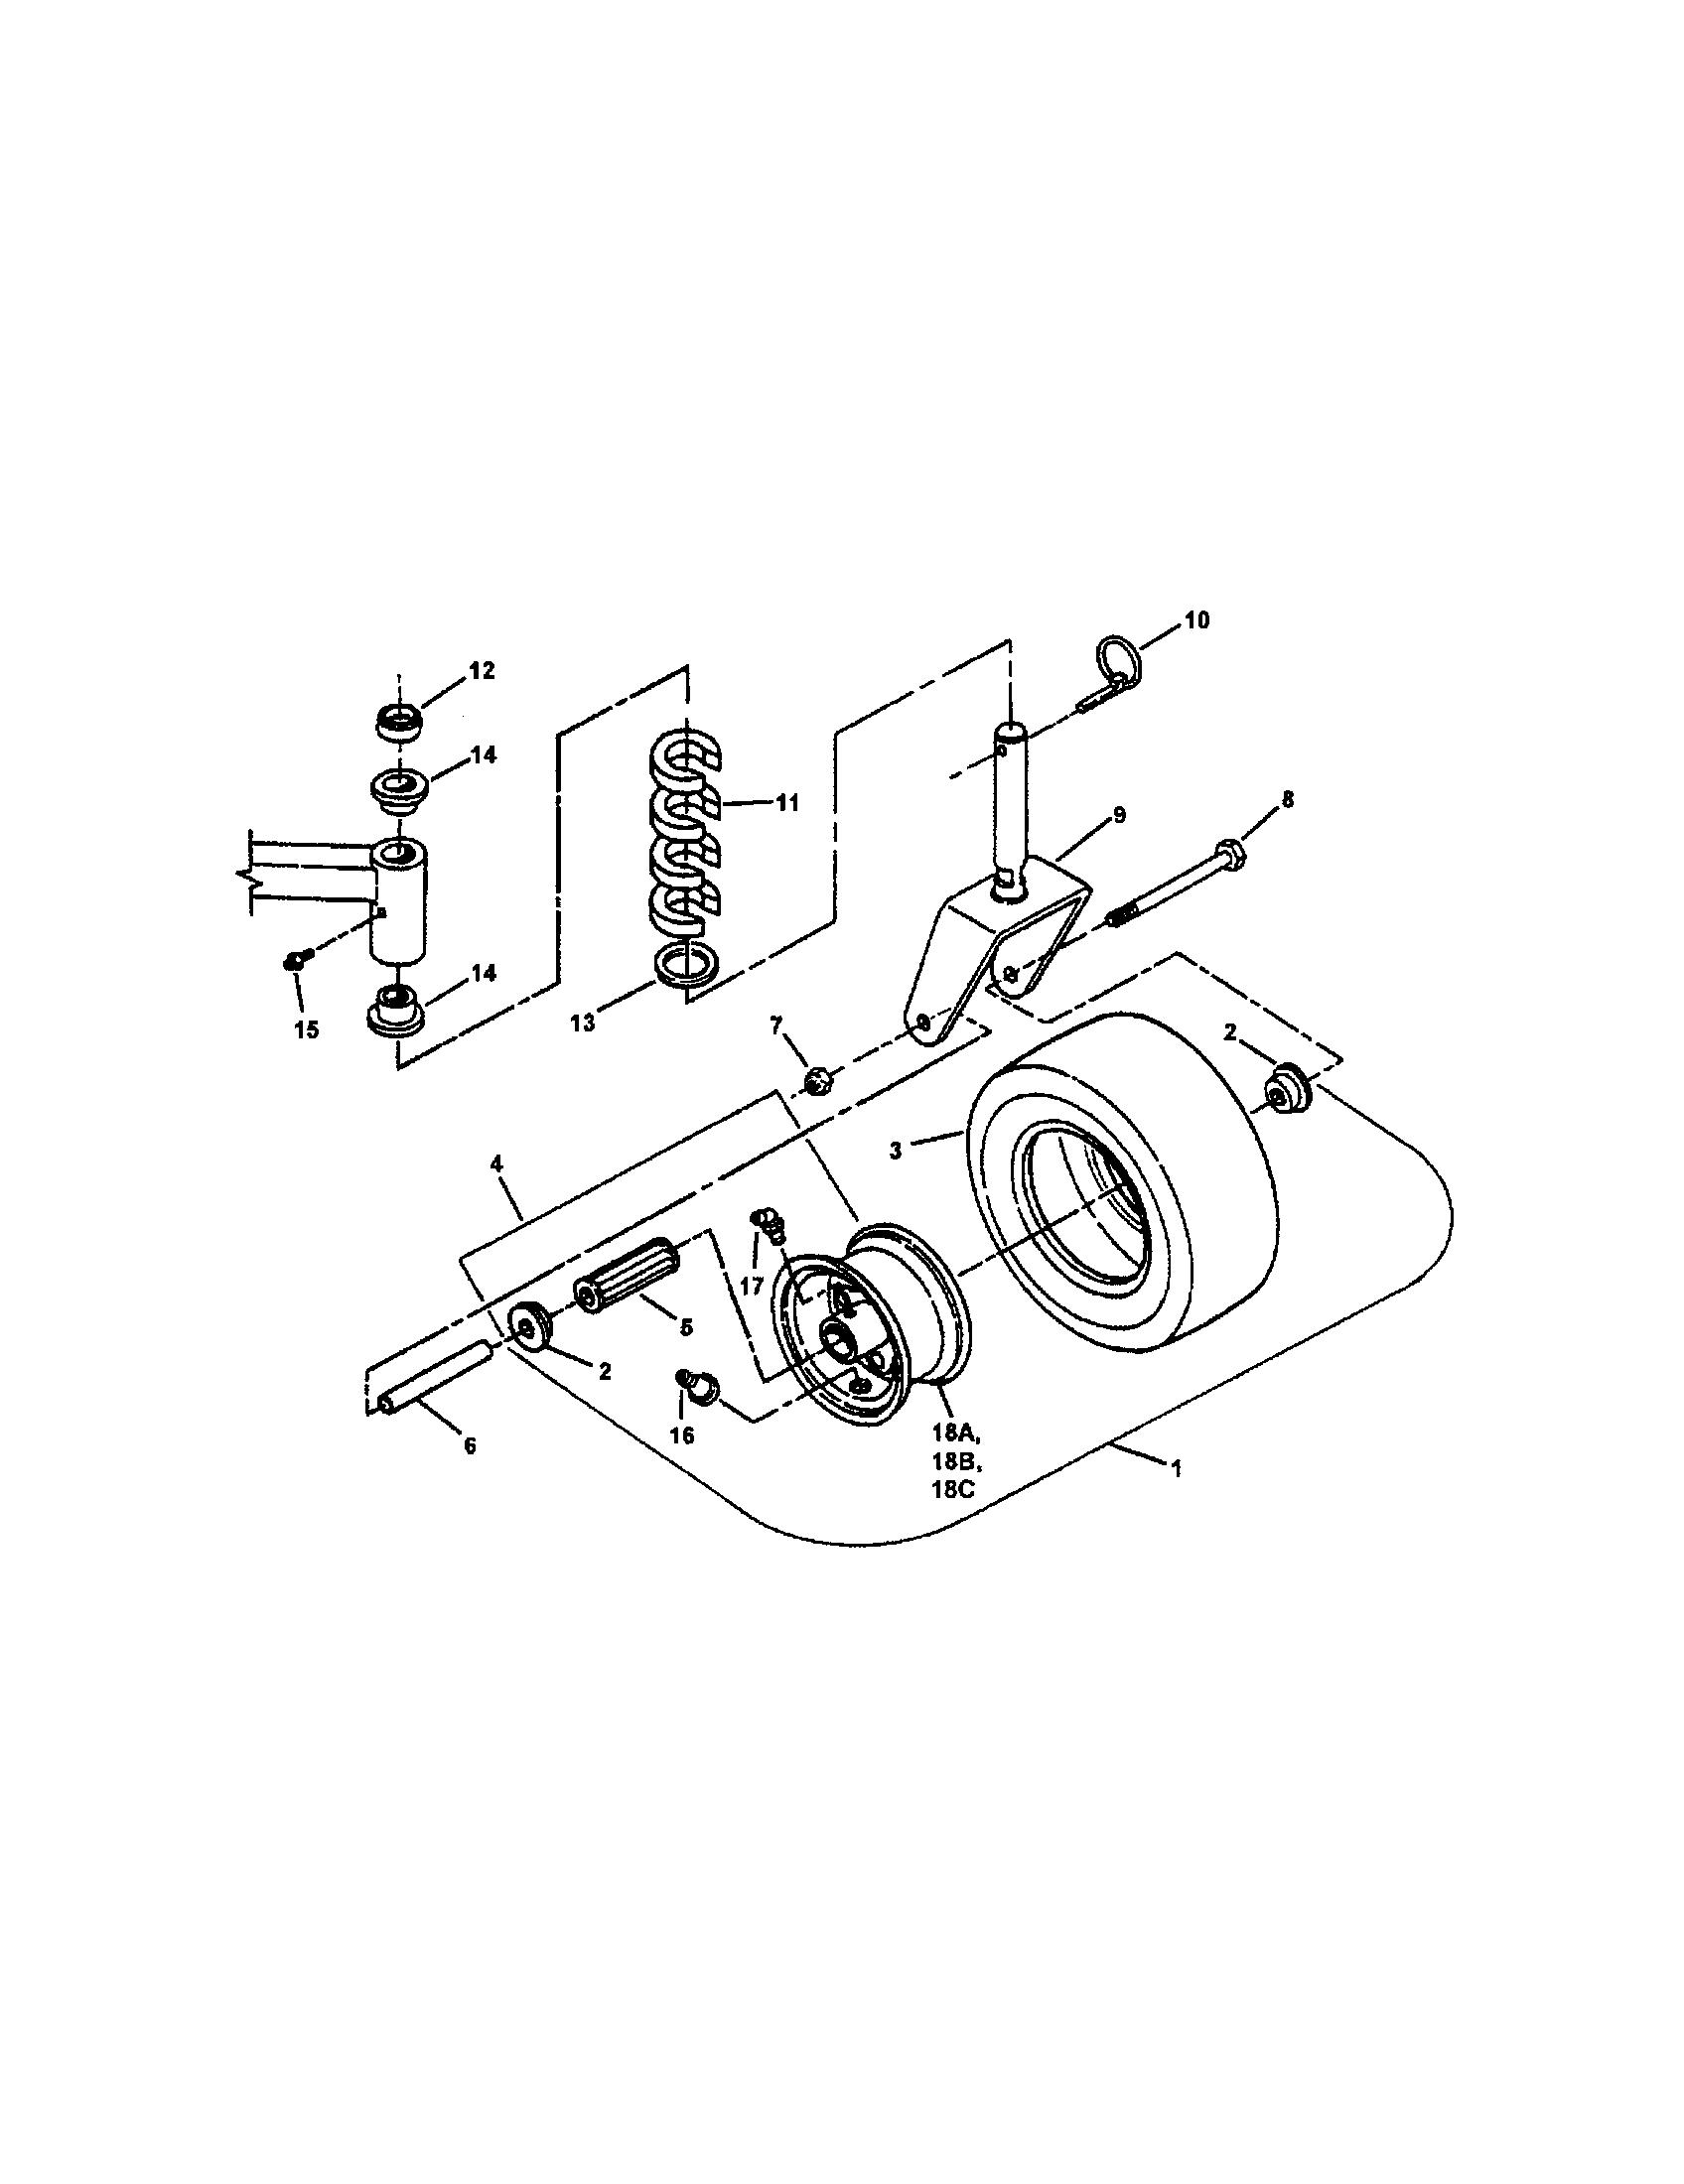 Gto Wiring Harnes Diagram Manual Of Walker Mower Harness Airplane Engine